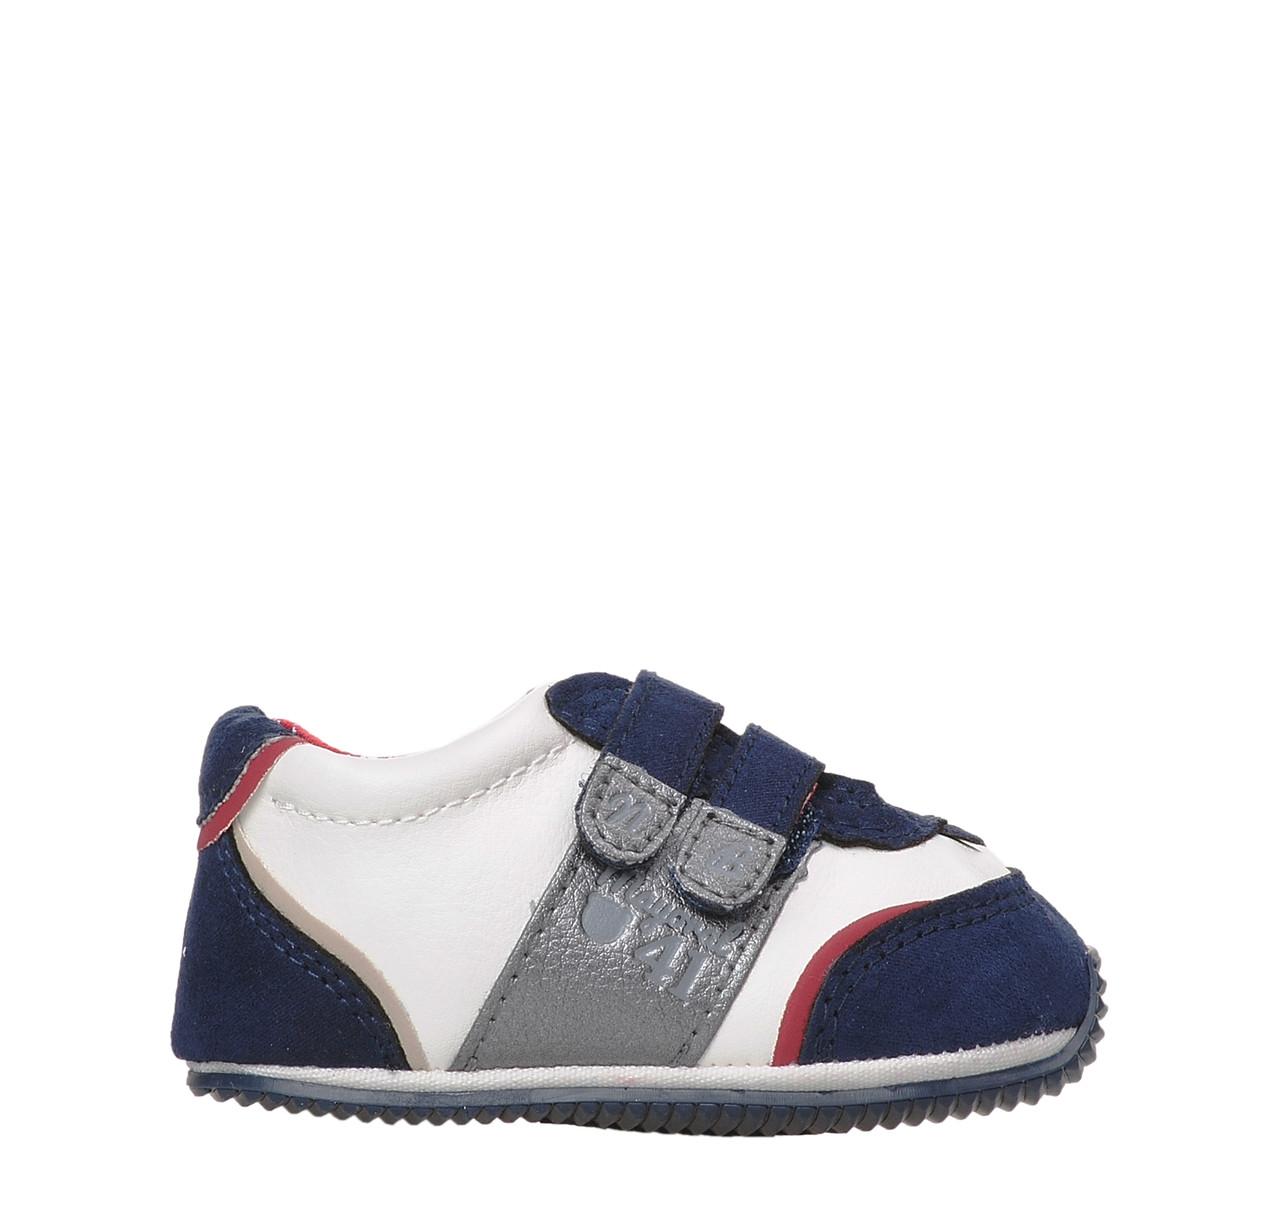 f9aa8d13955 Παιδικά > Βρέφη > Παπούτσια / CONVERSE - Βρεφικά παπούτσια Chuck ...